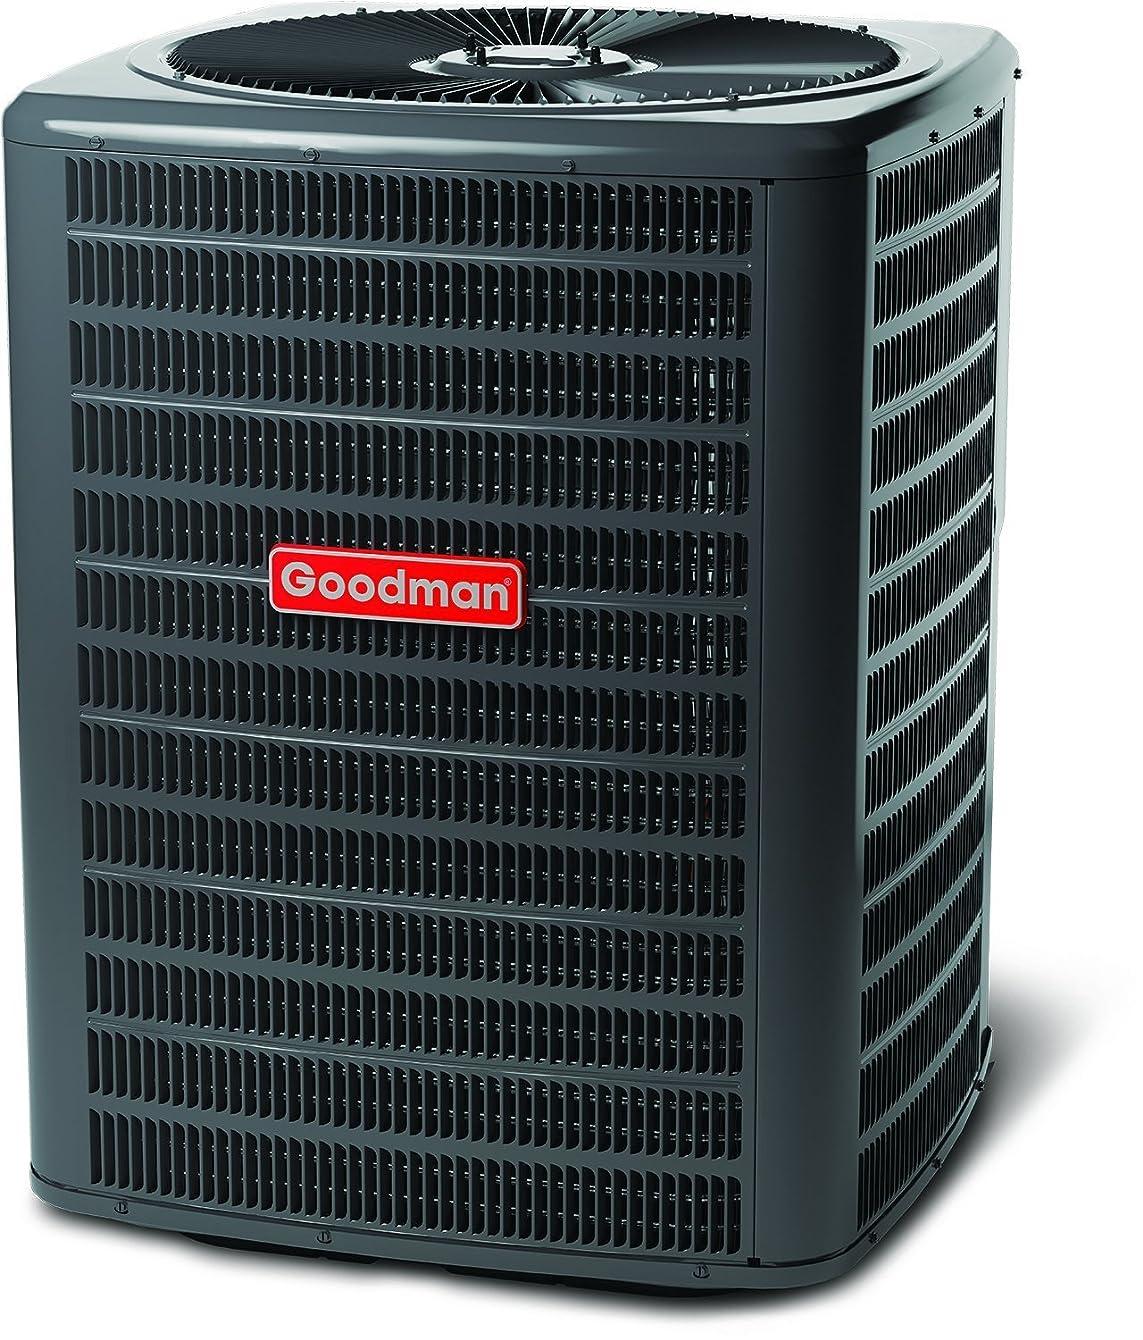 Goodman R410A 13 SEER Complete Split System Heat Pump 4 Ton GSZ130481, ARUF48D14